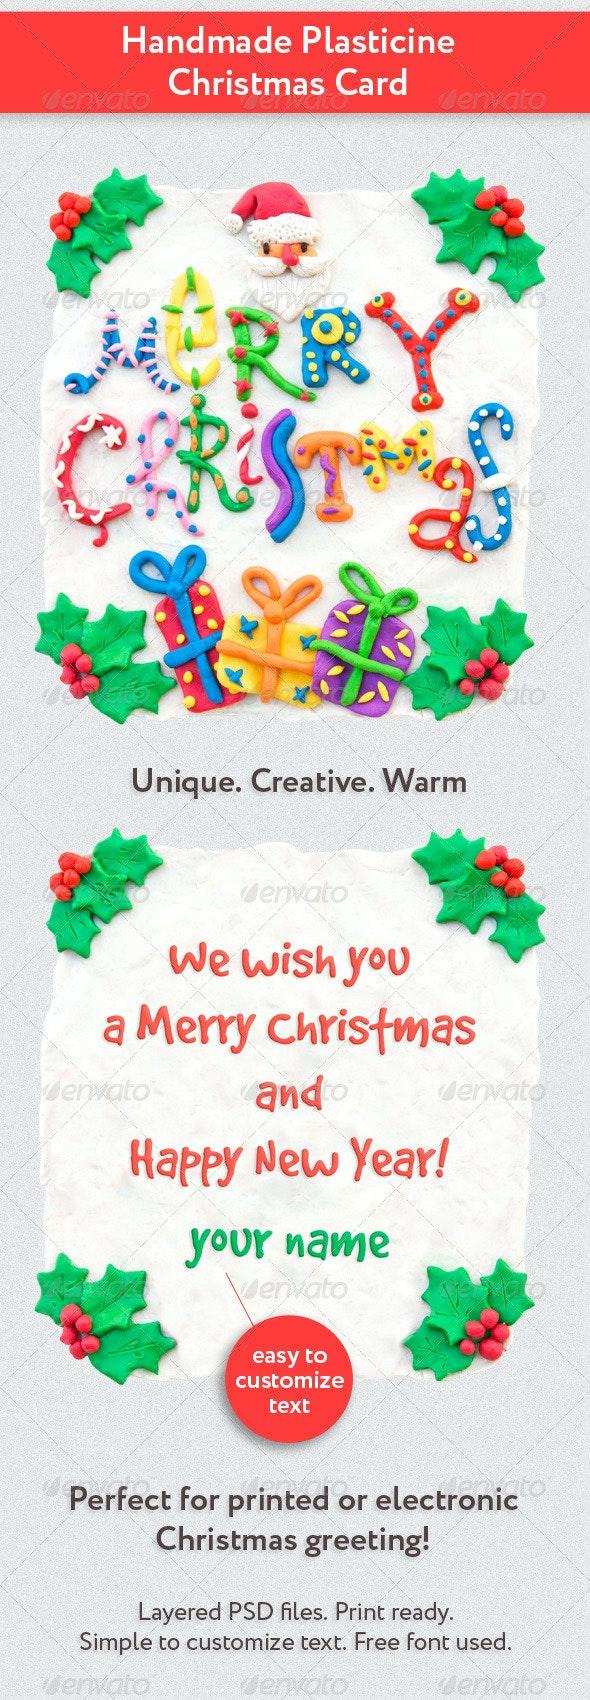 Handmade Plasticine Christmas Card - Holiday Greeting Cards